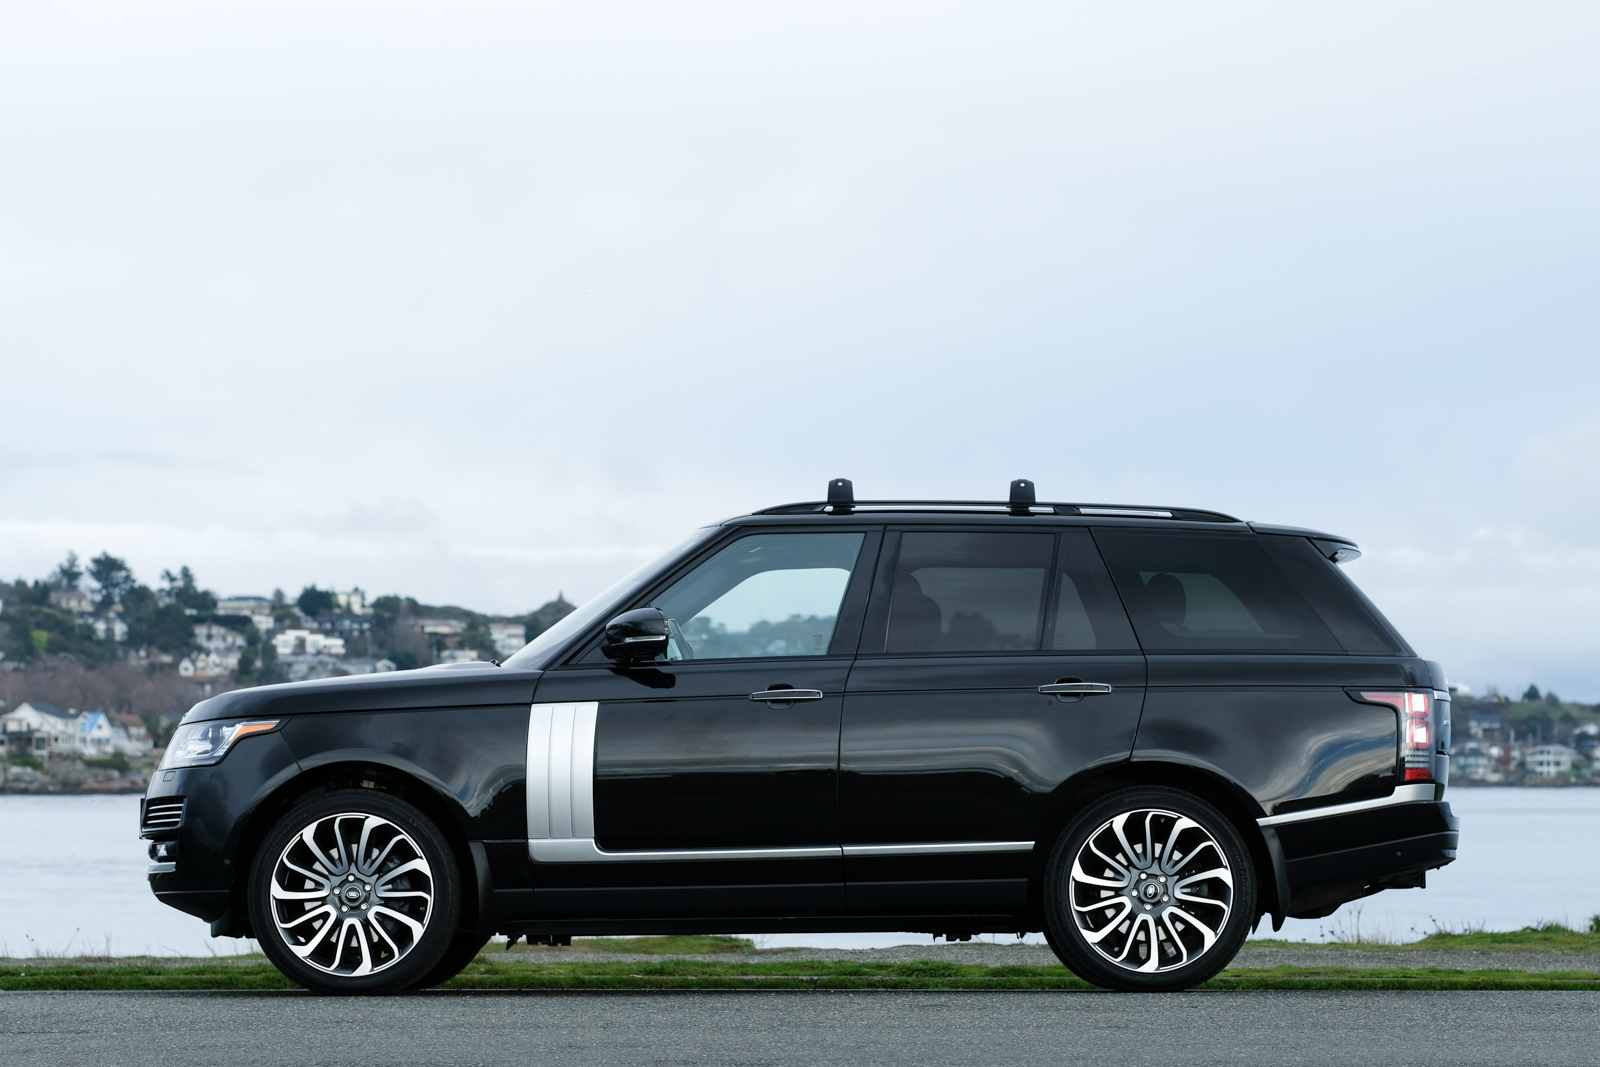 2014 Range Rover Autobiography SC - Silver Arrow Cars Ltd.